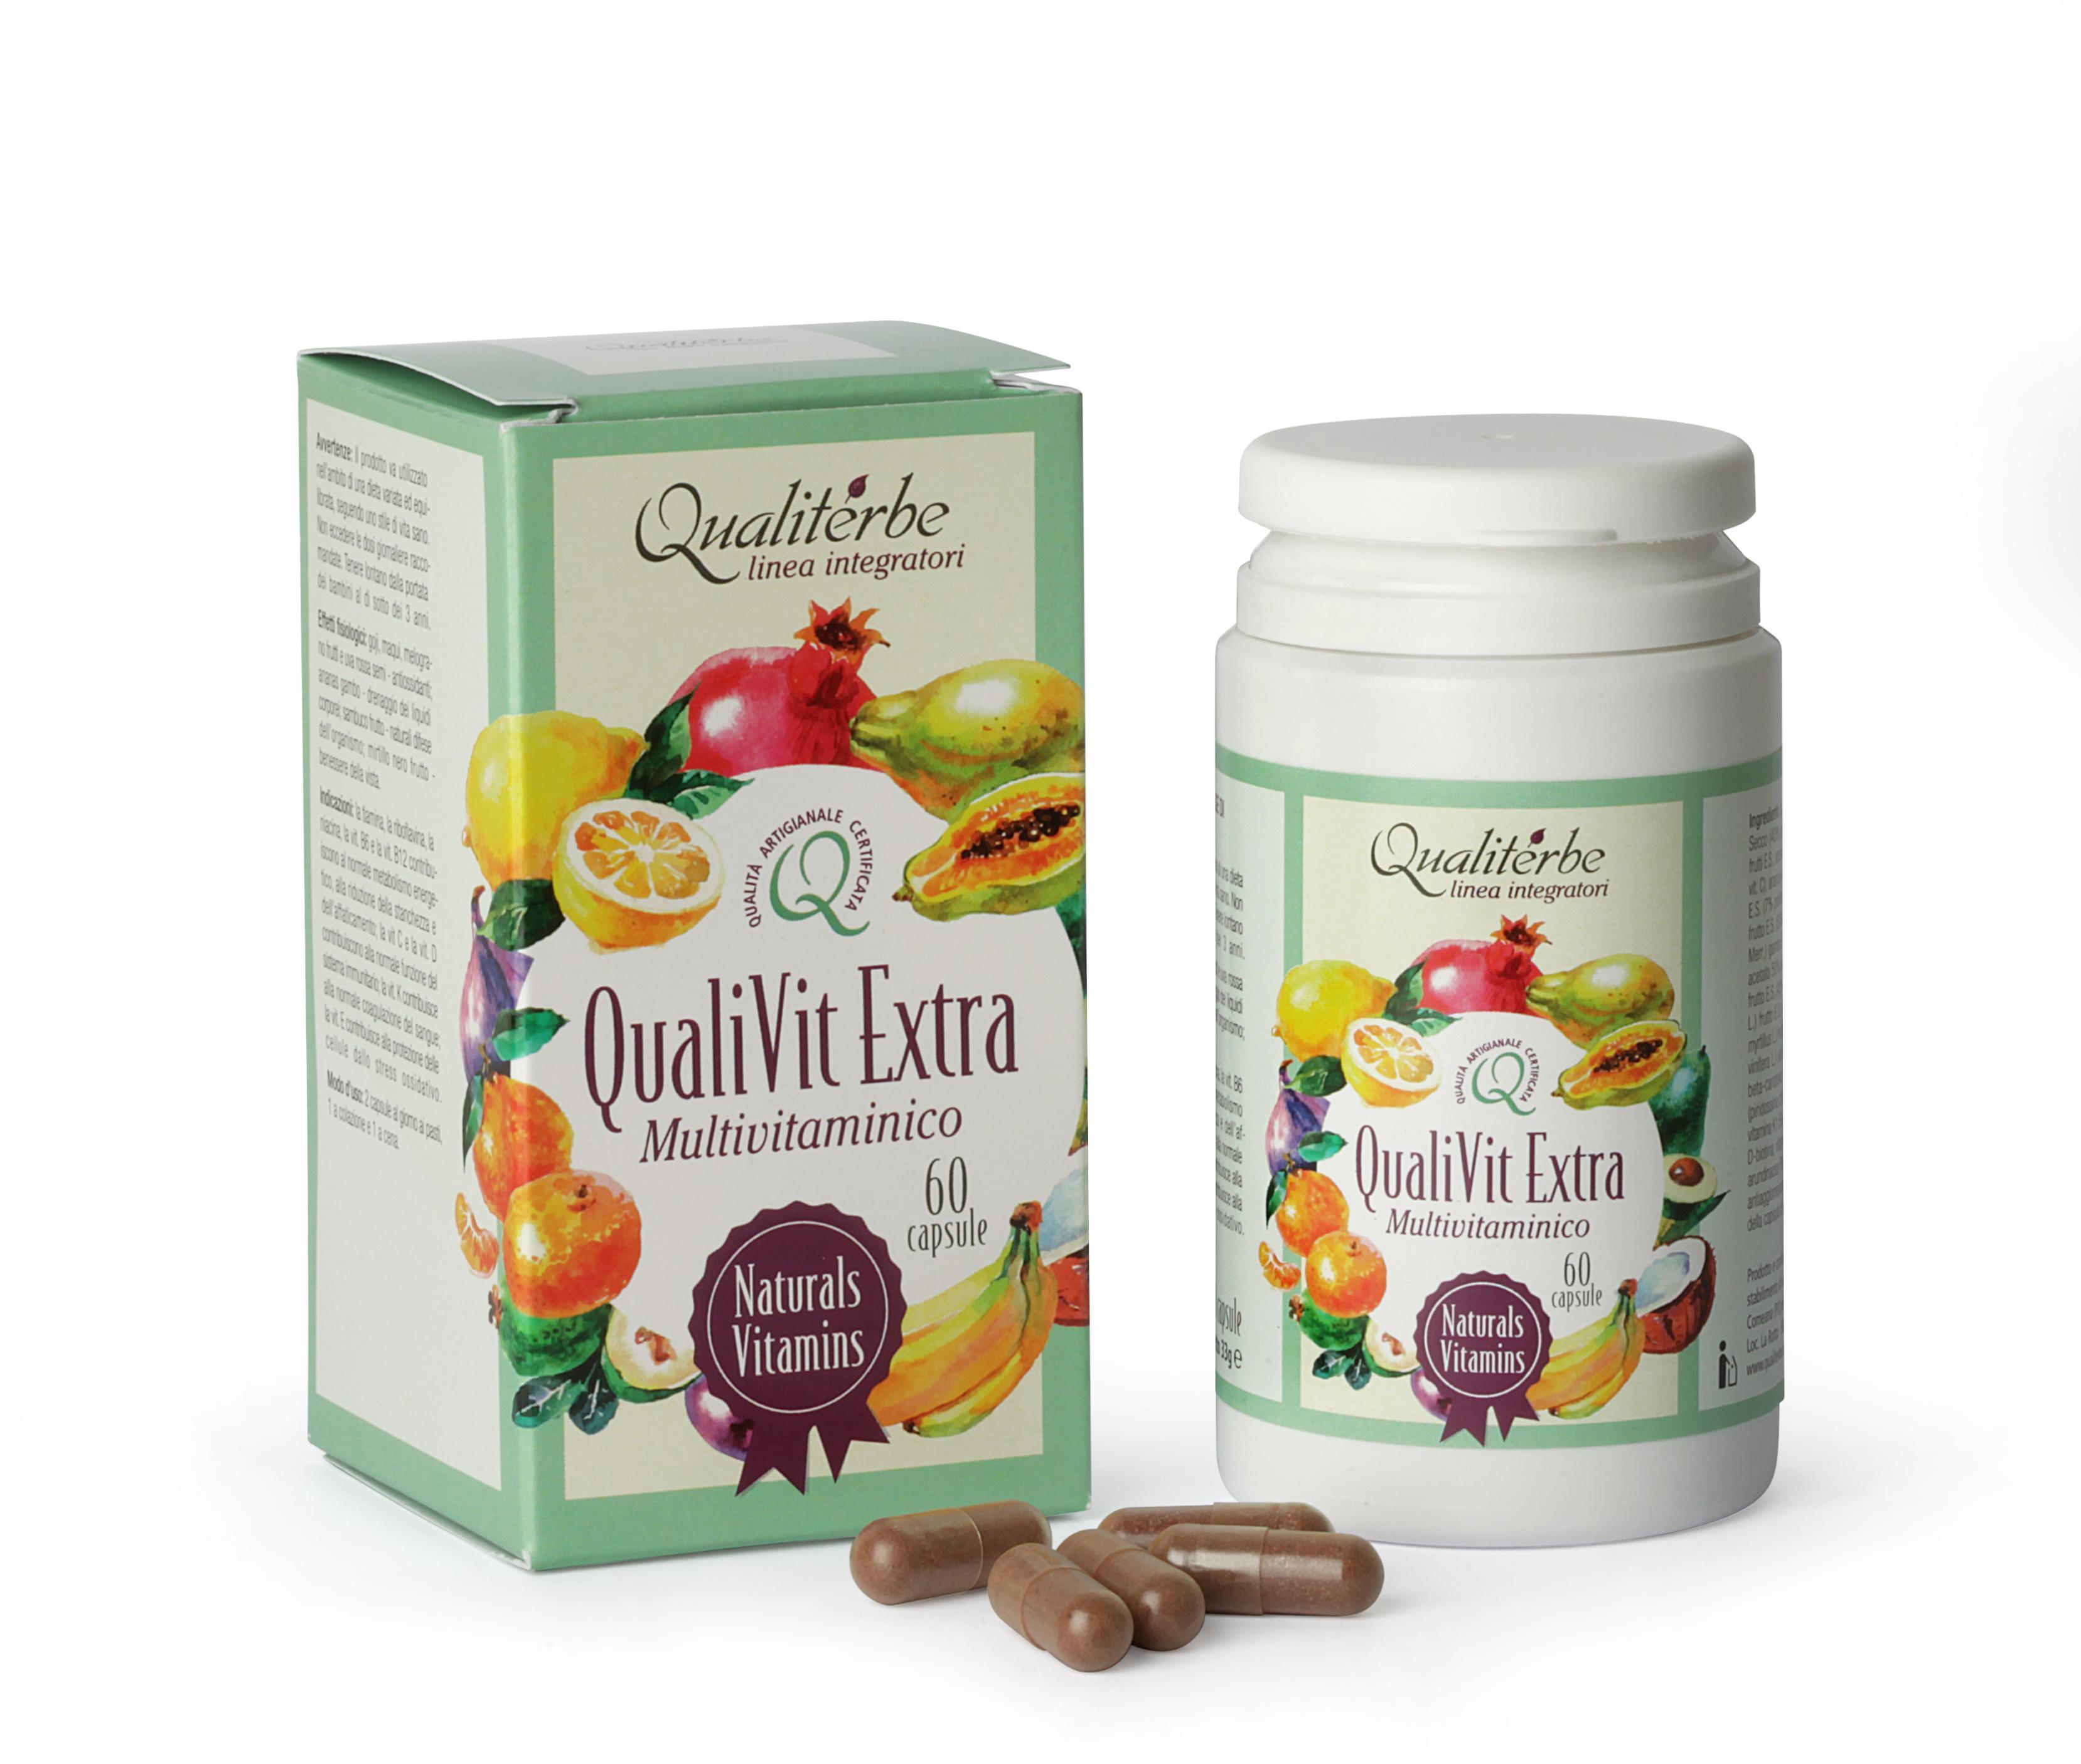 QualiVit Extra - Vitamine ed estratti vegetali